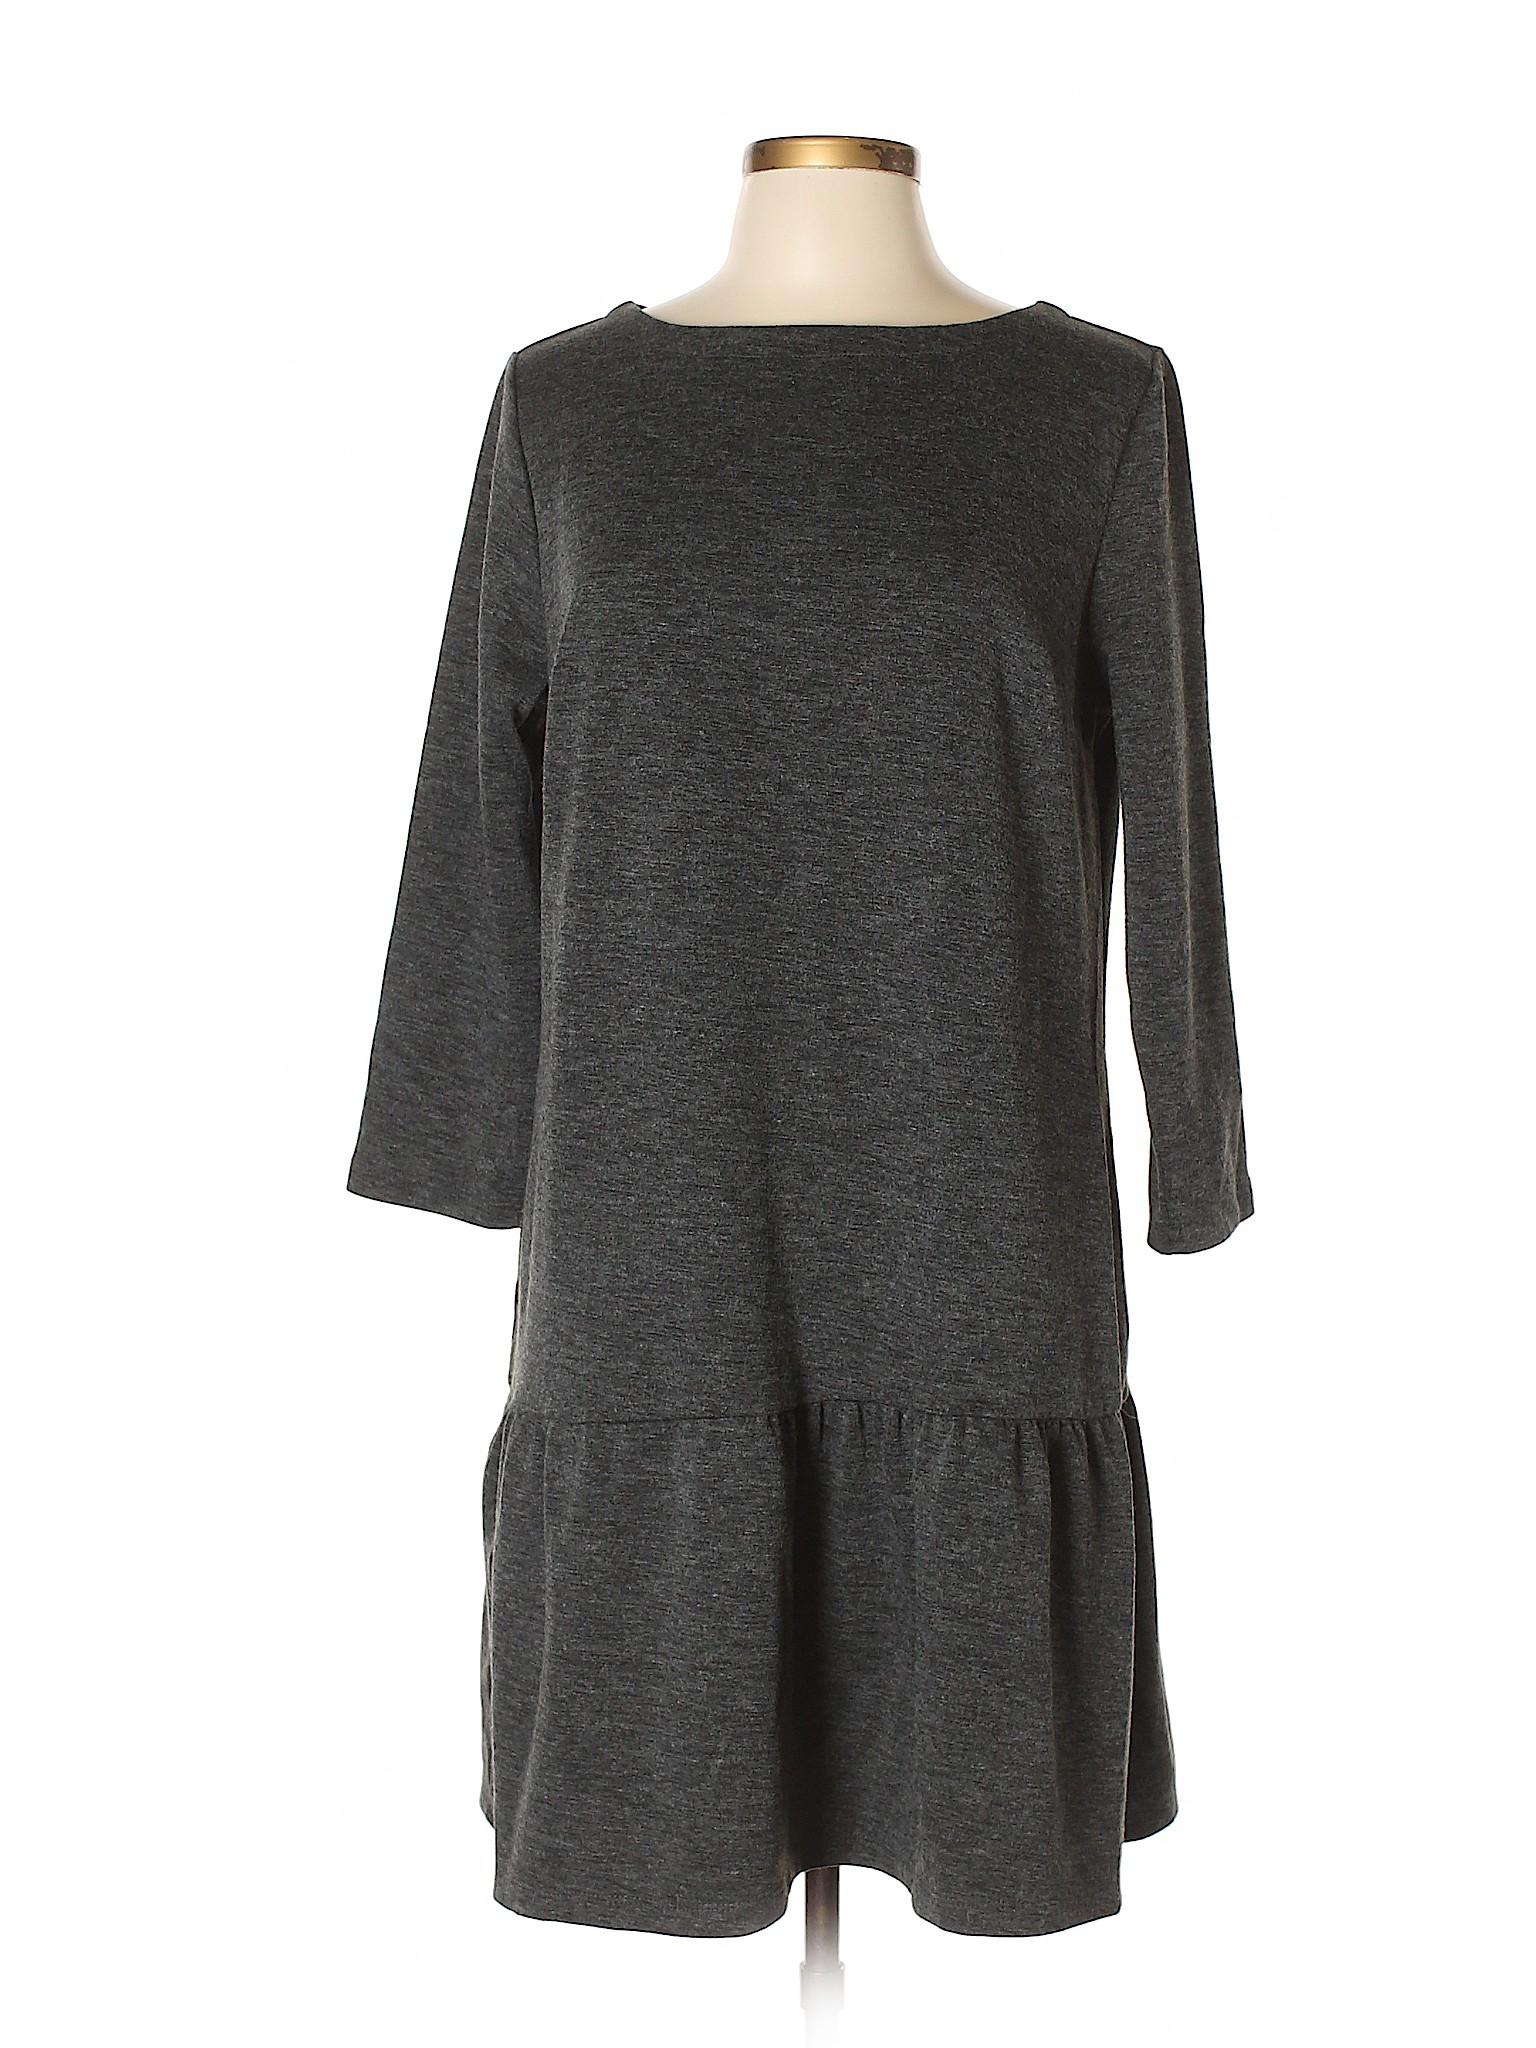 Selling LOFT Ann Casual Taylor Dress rWrz6T